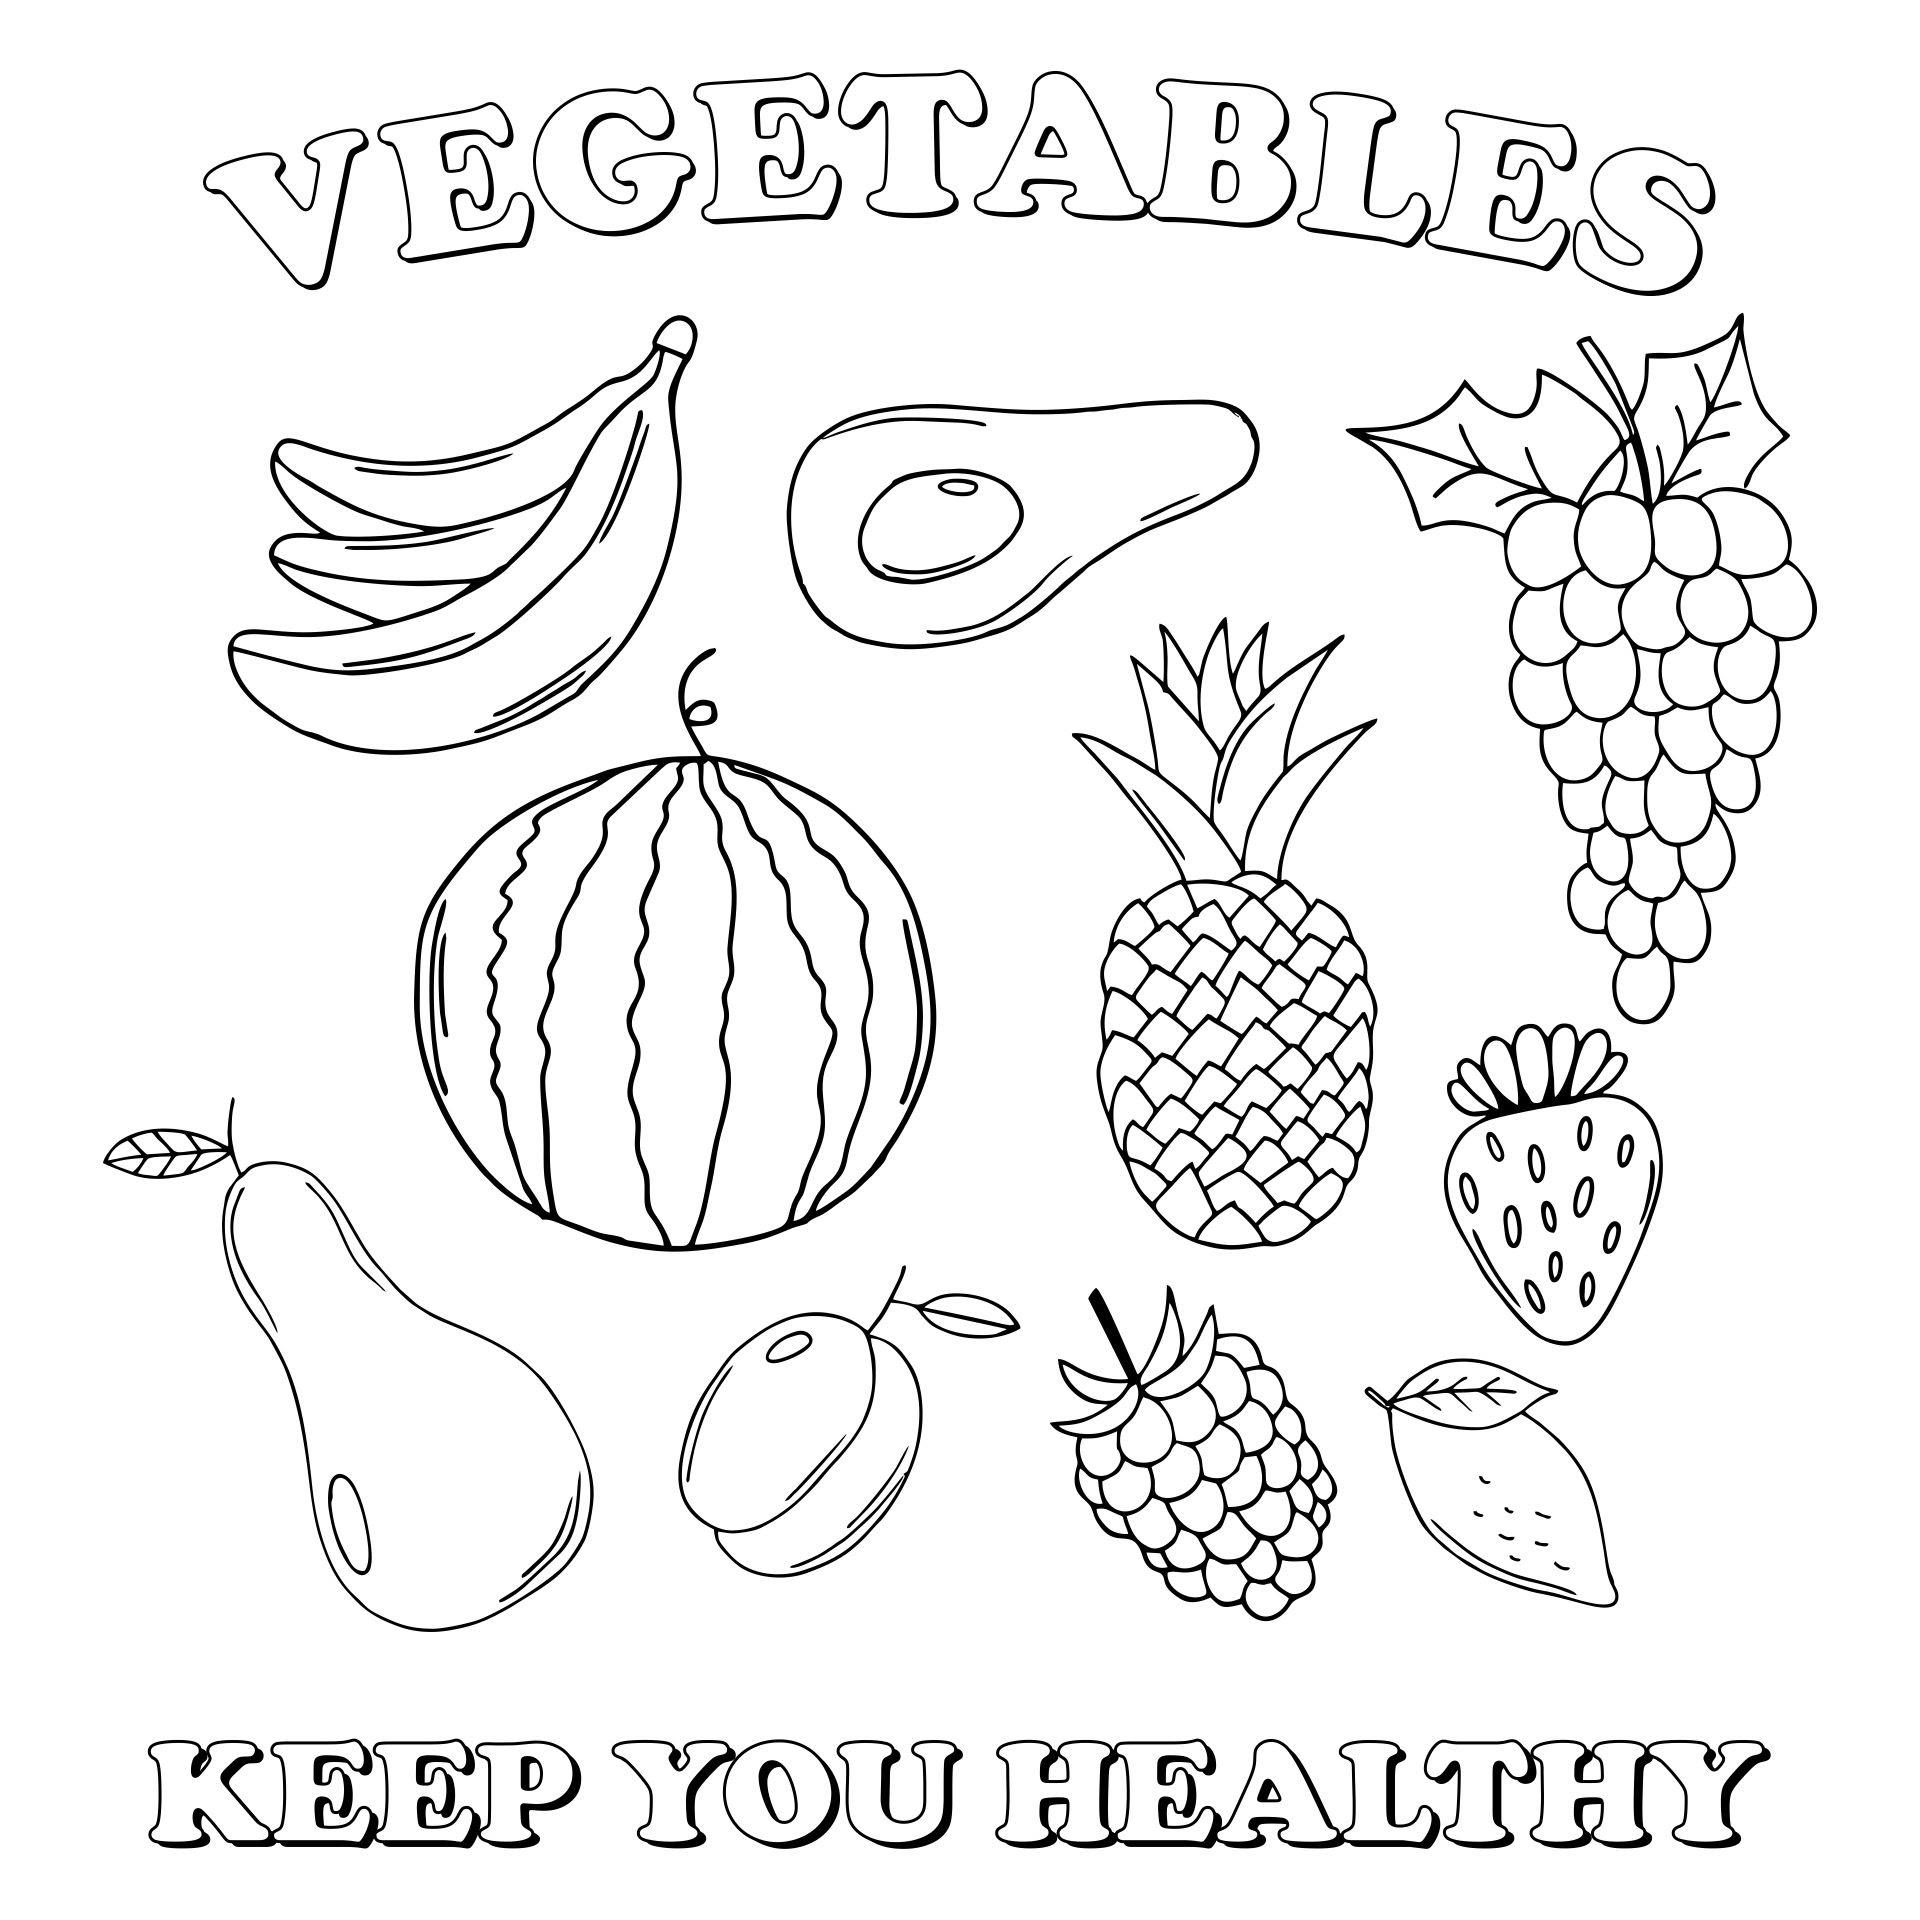 Cornucopia Vegetables Coloring Page | Vegetable coloring pages ... | 1024x791